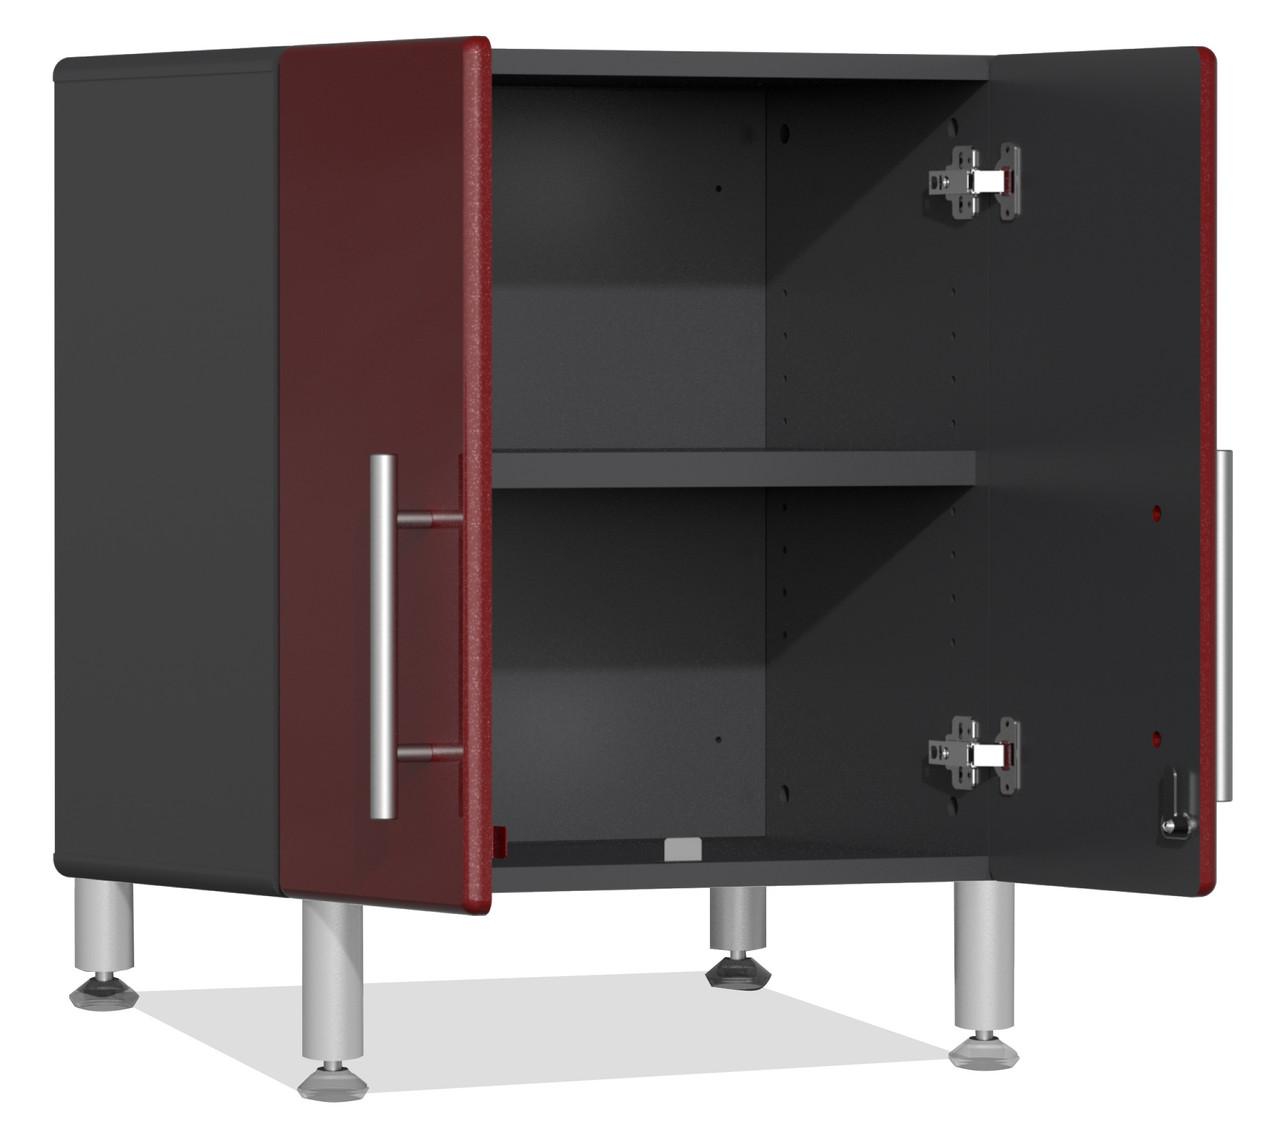 Ulti-MATE Garage 2.0 Series 2-Door All-Purpose Base Cabinet (UG21309R)